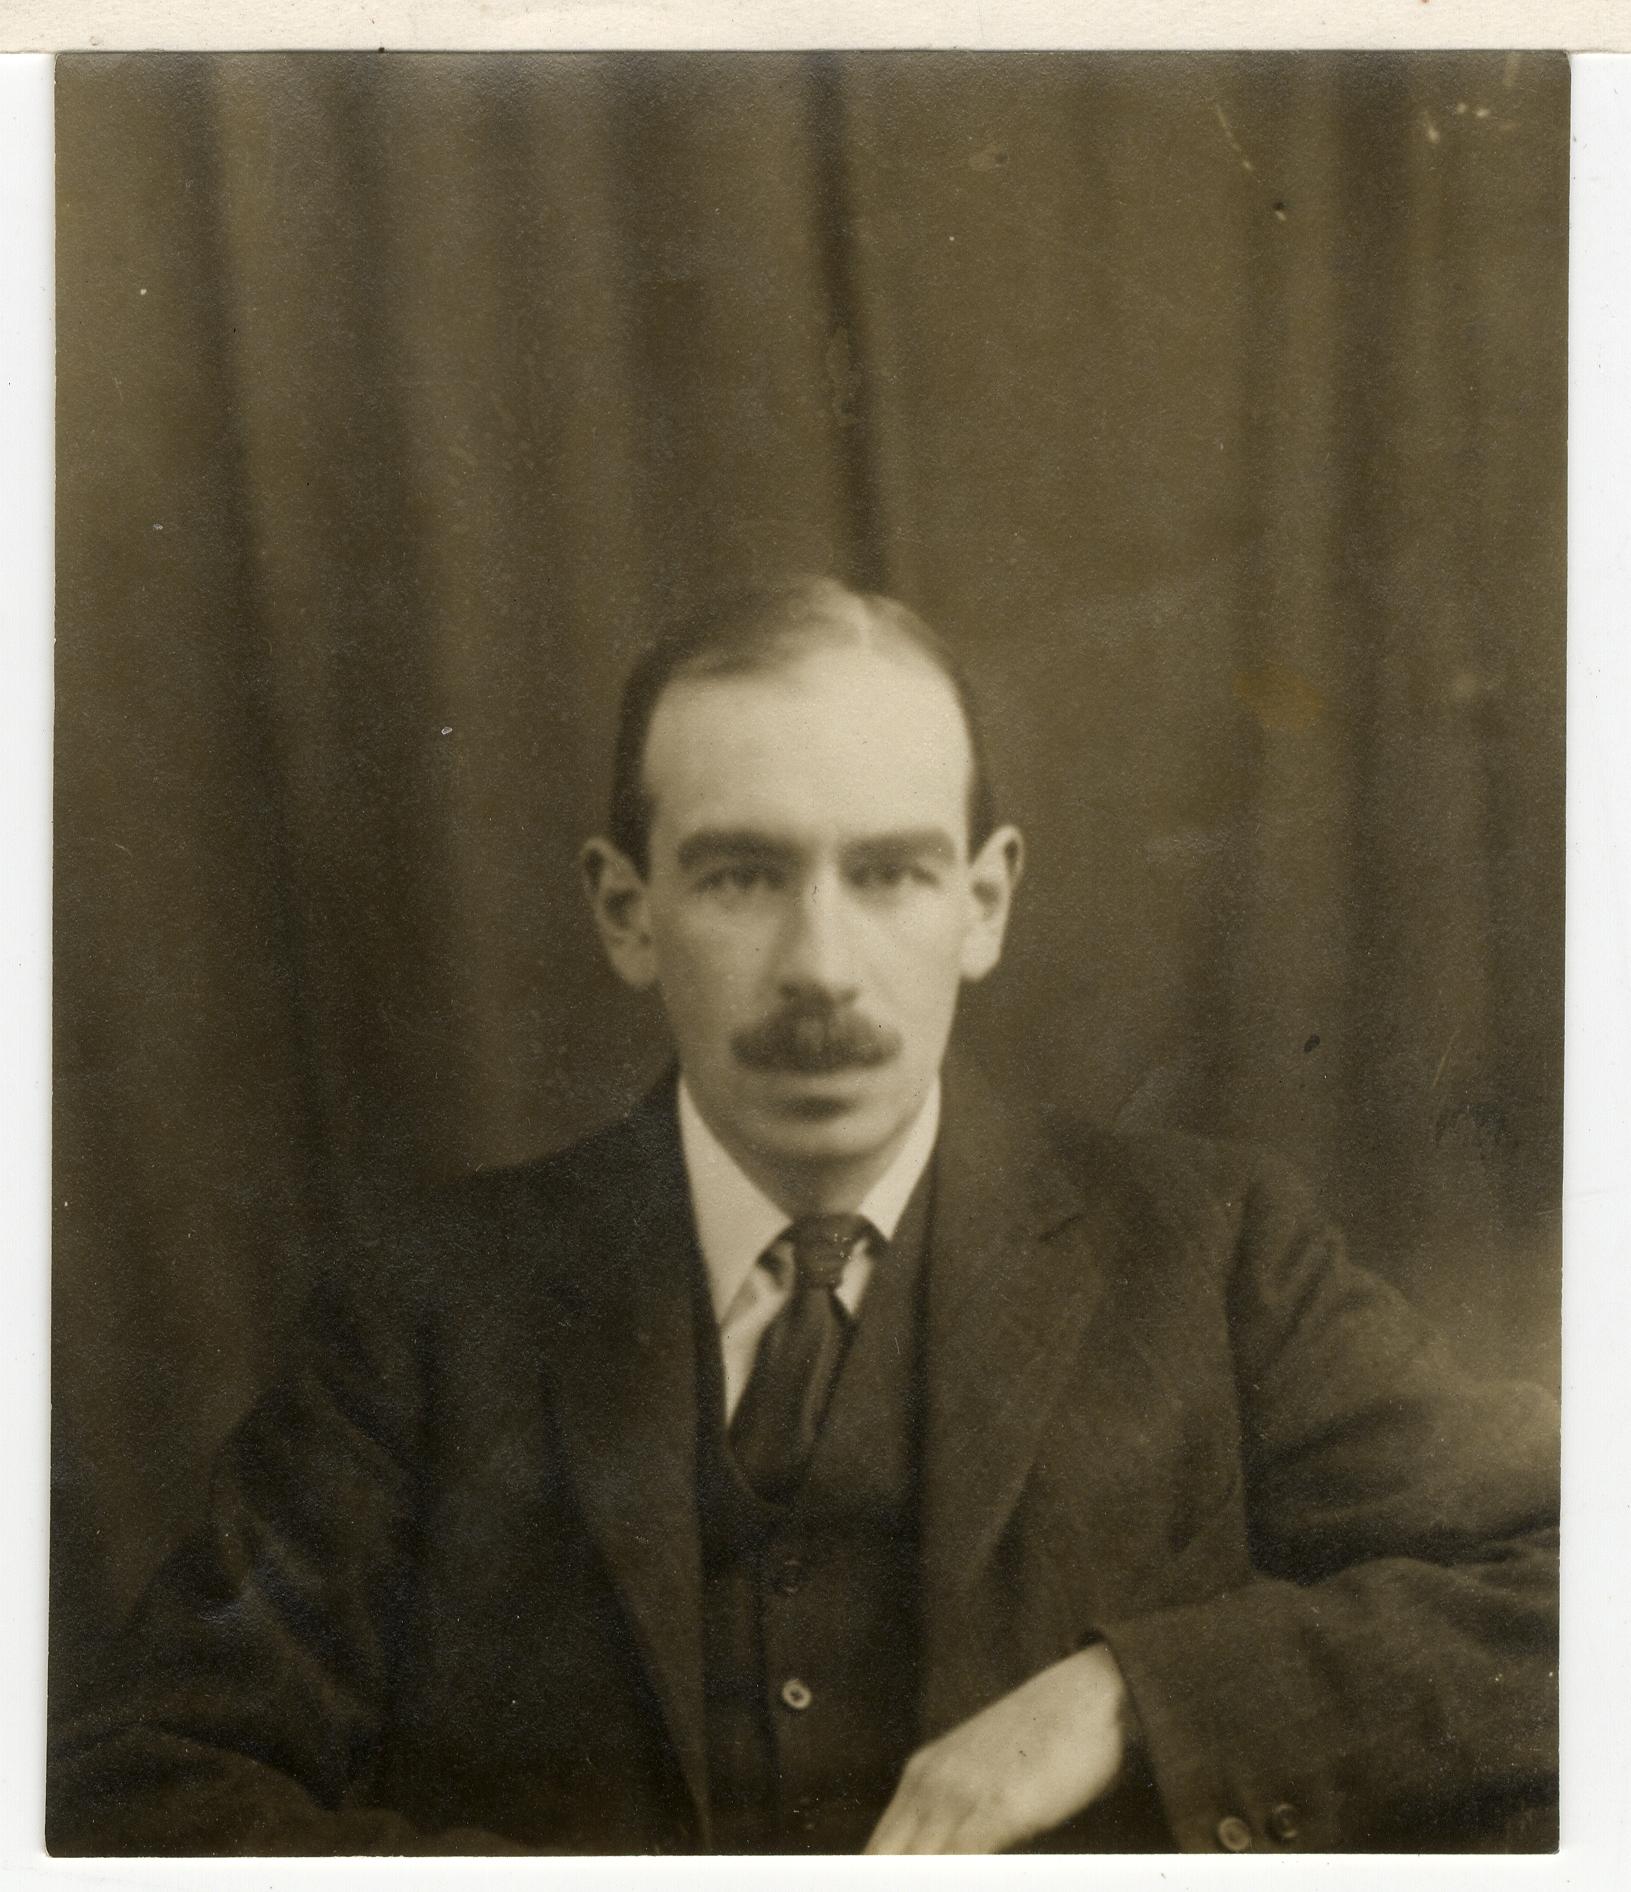 John Maynard Keynes. [JMK/PP/94/161]